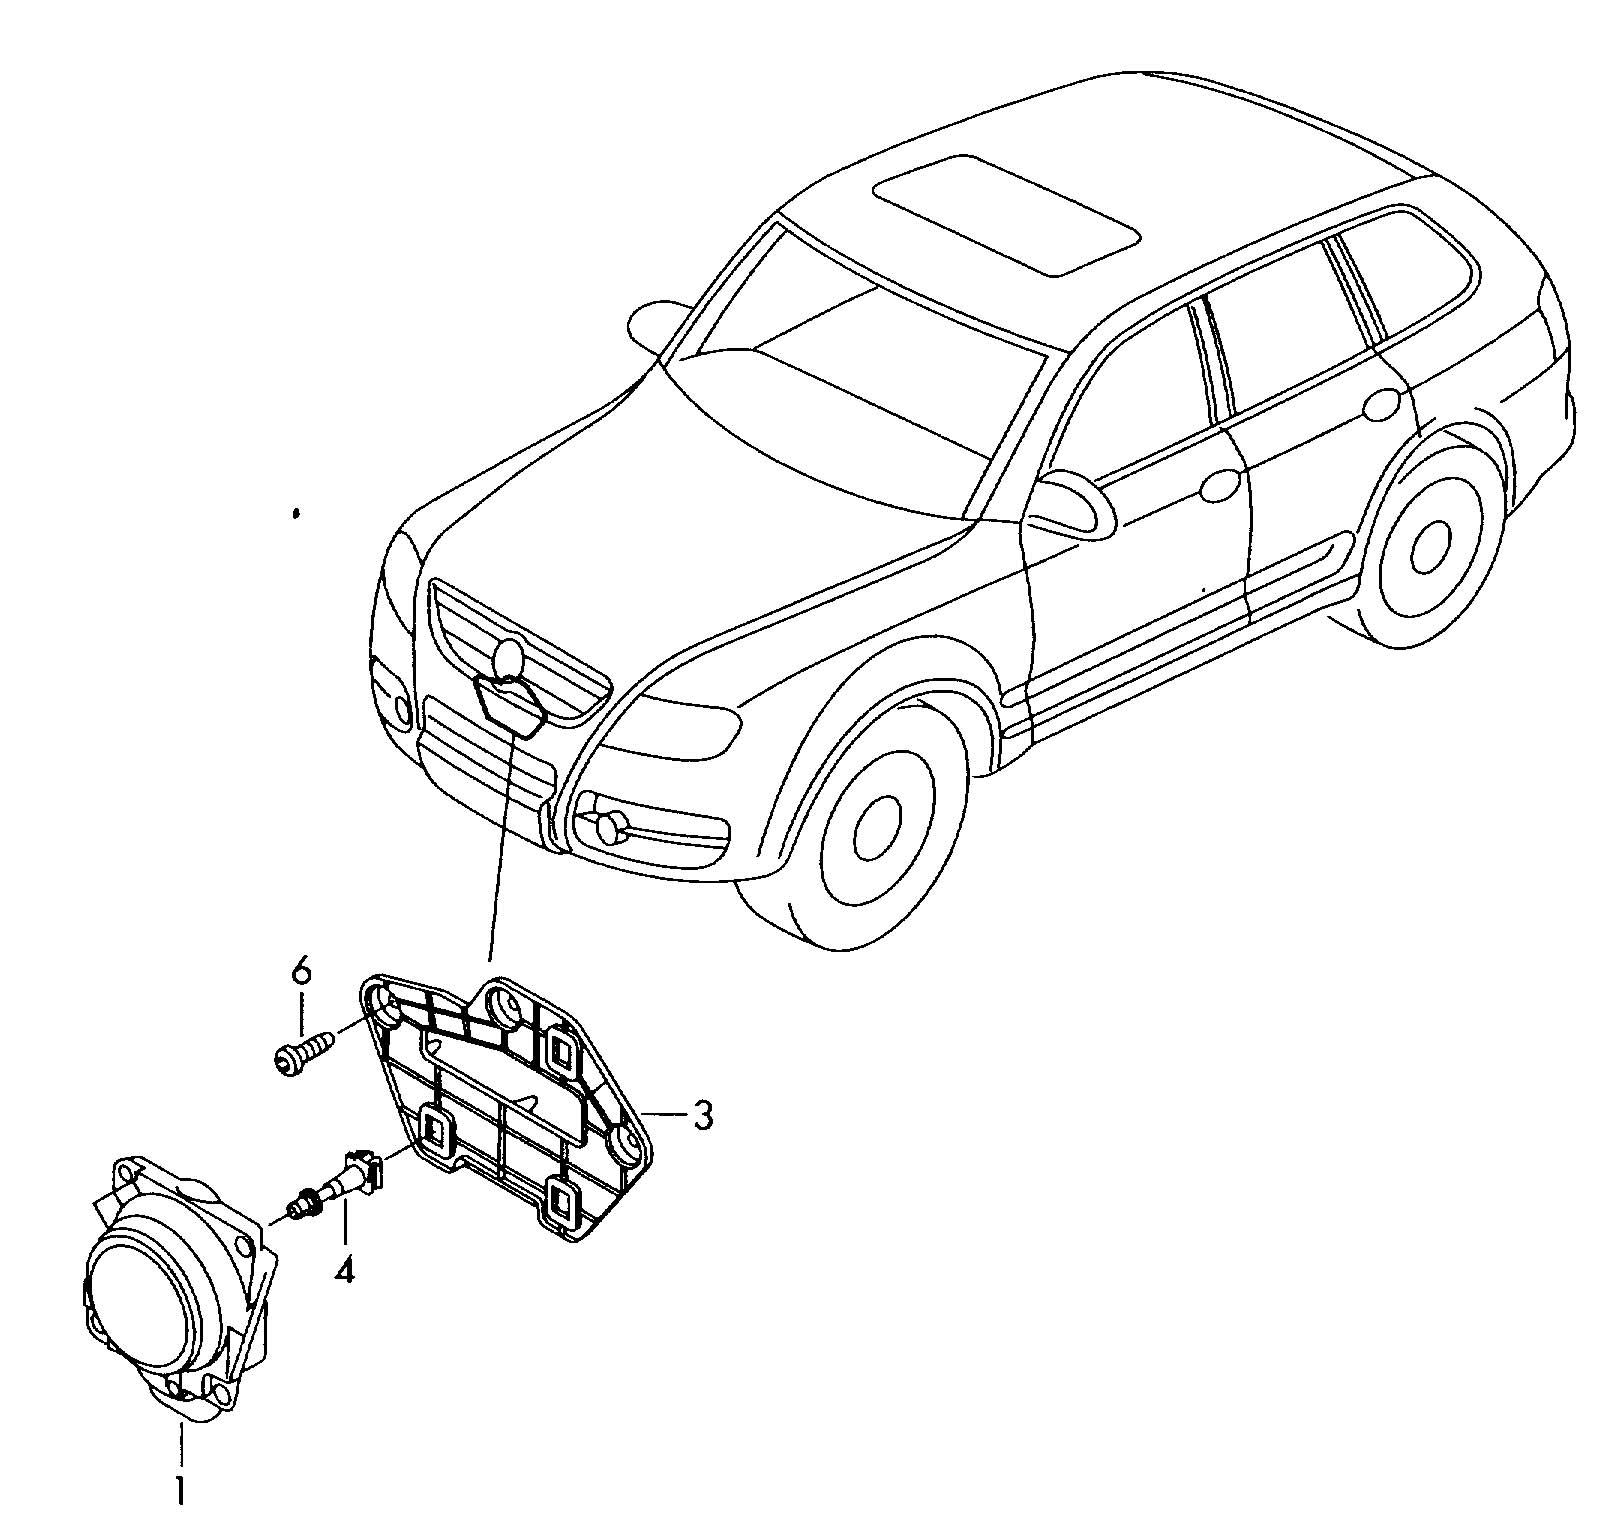 Volkswagen Touareg Radar Sensor Bracket Also Use